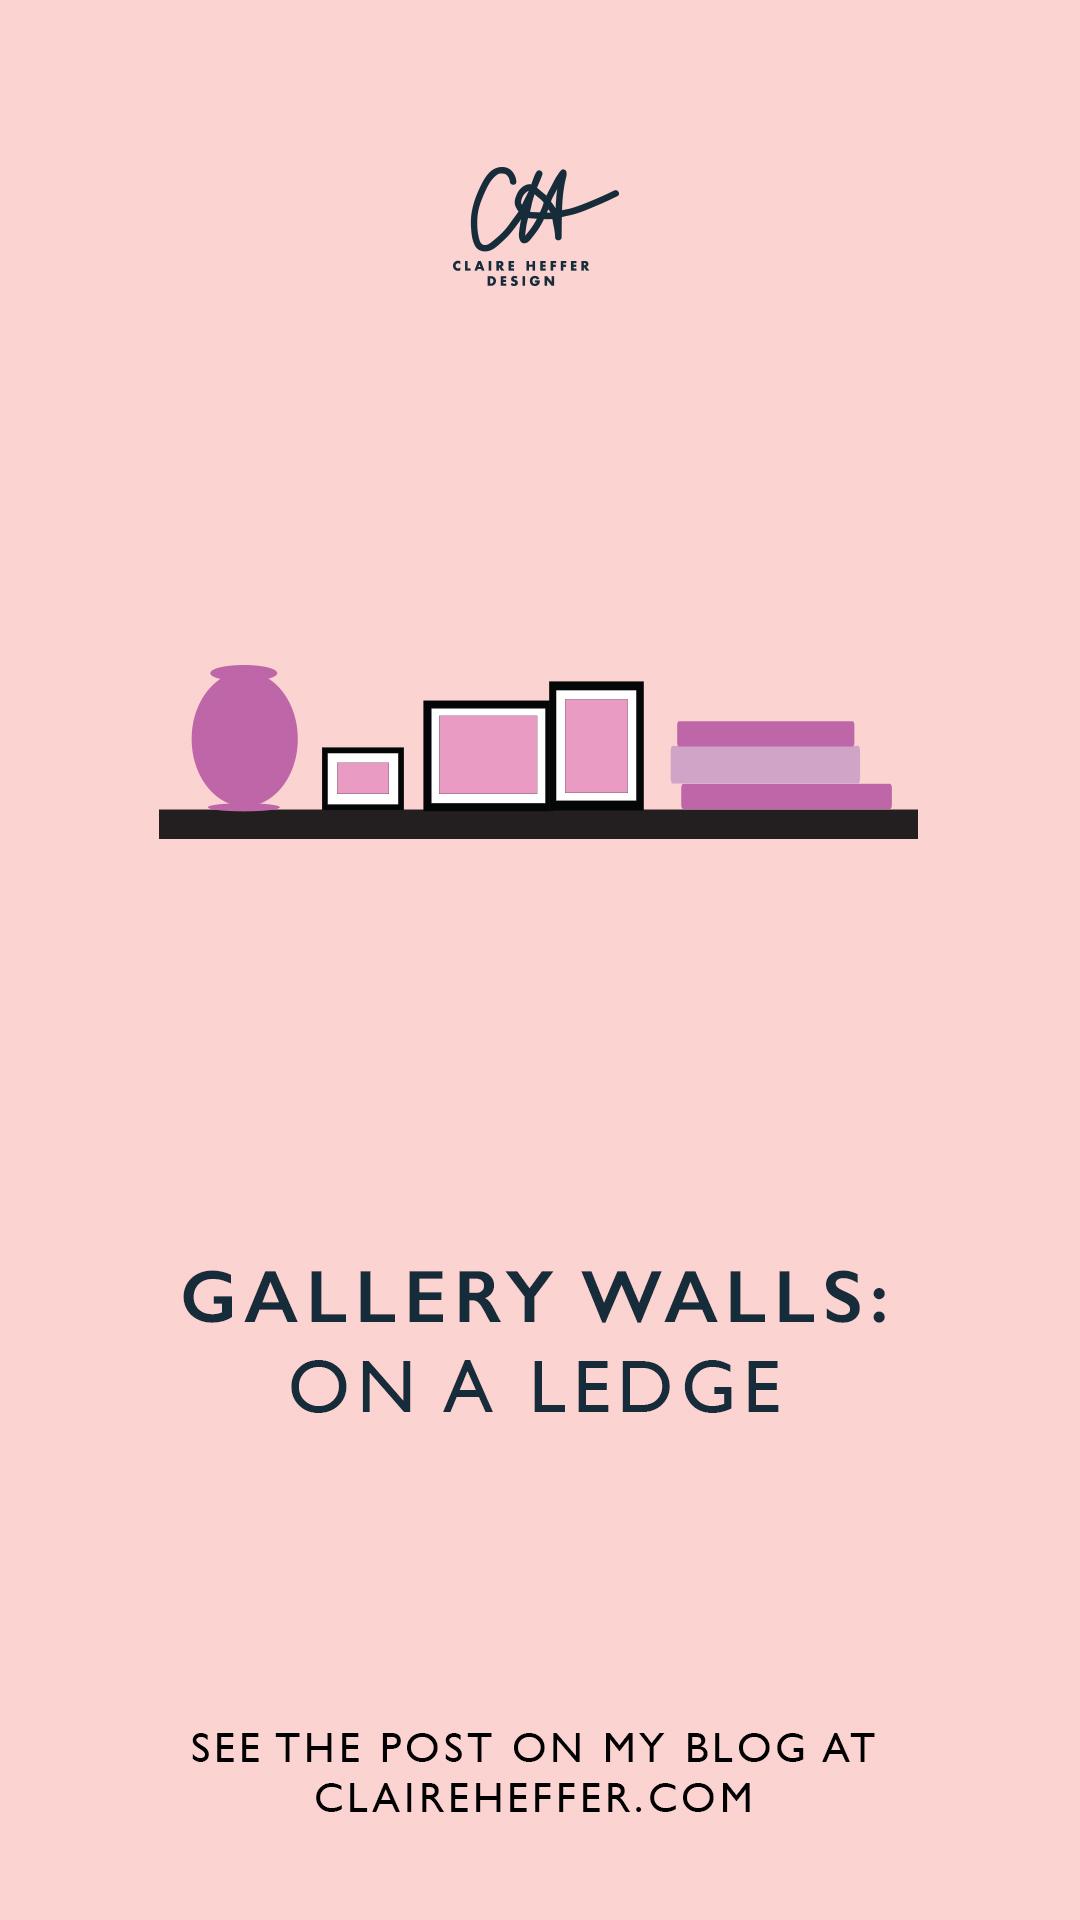 GALLERY WALLS ON A LEDGE.jpg